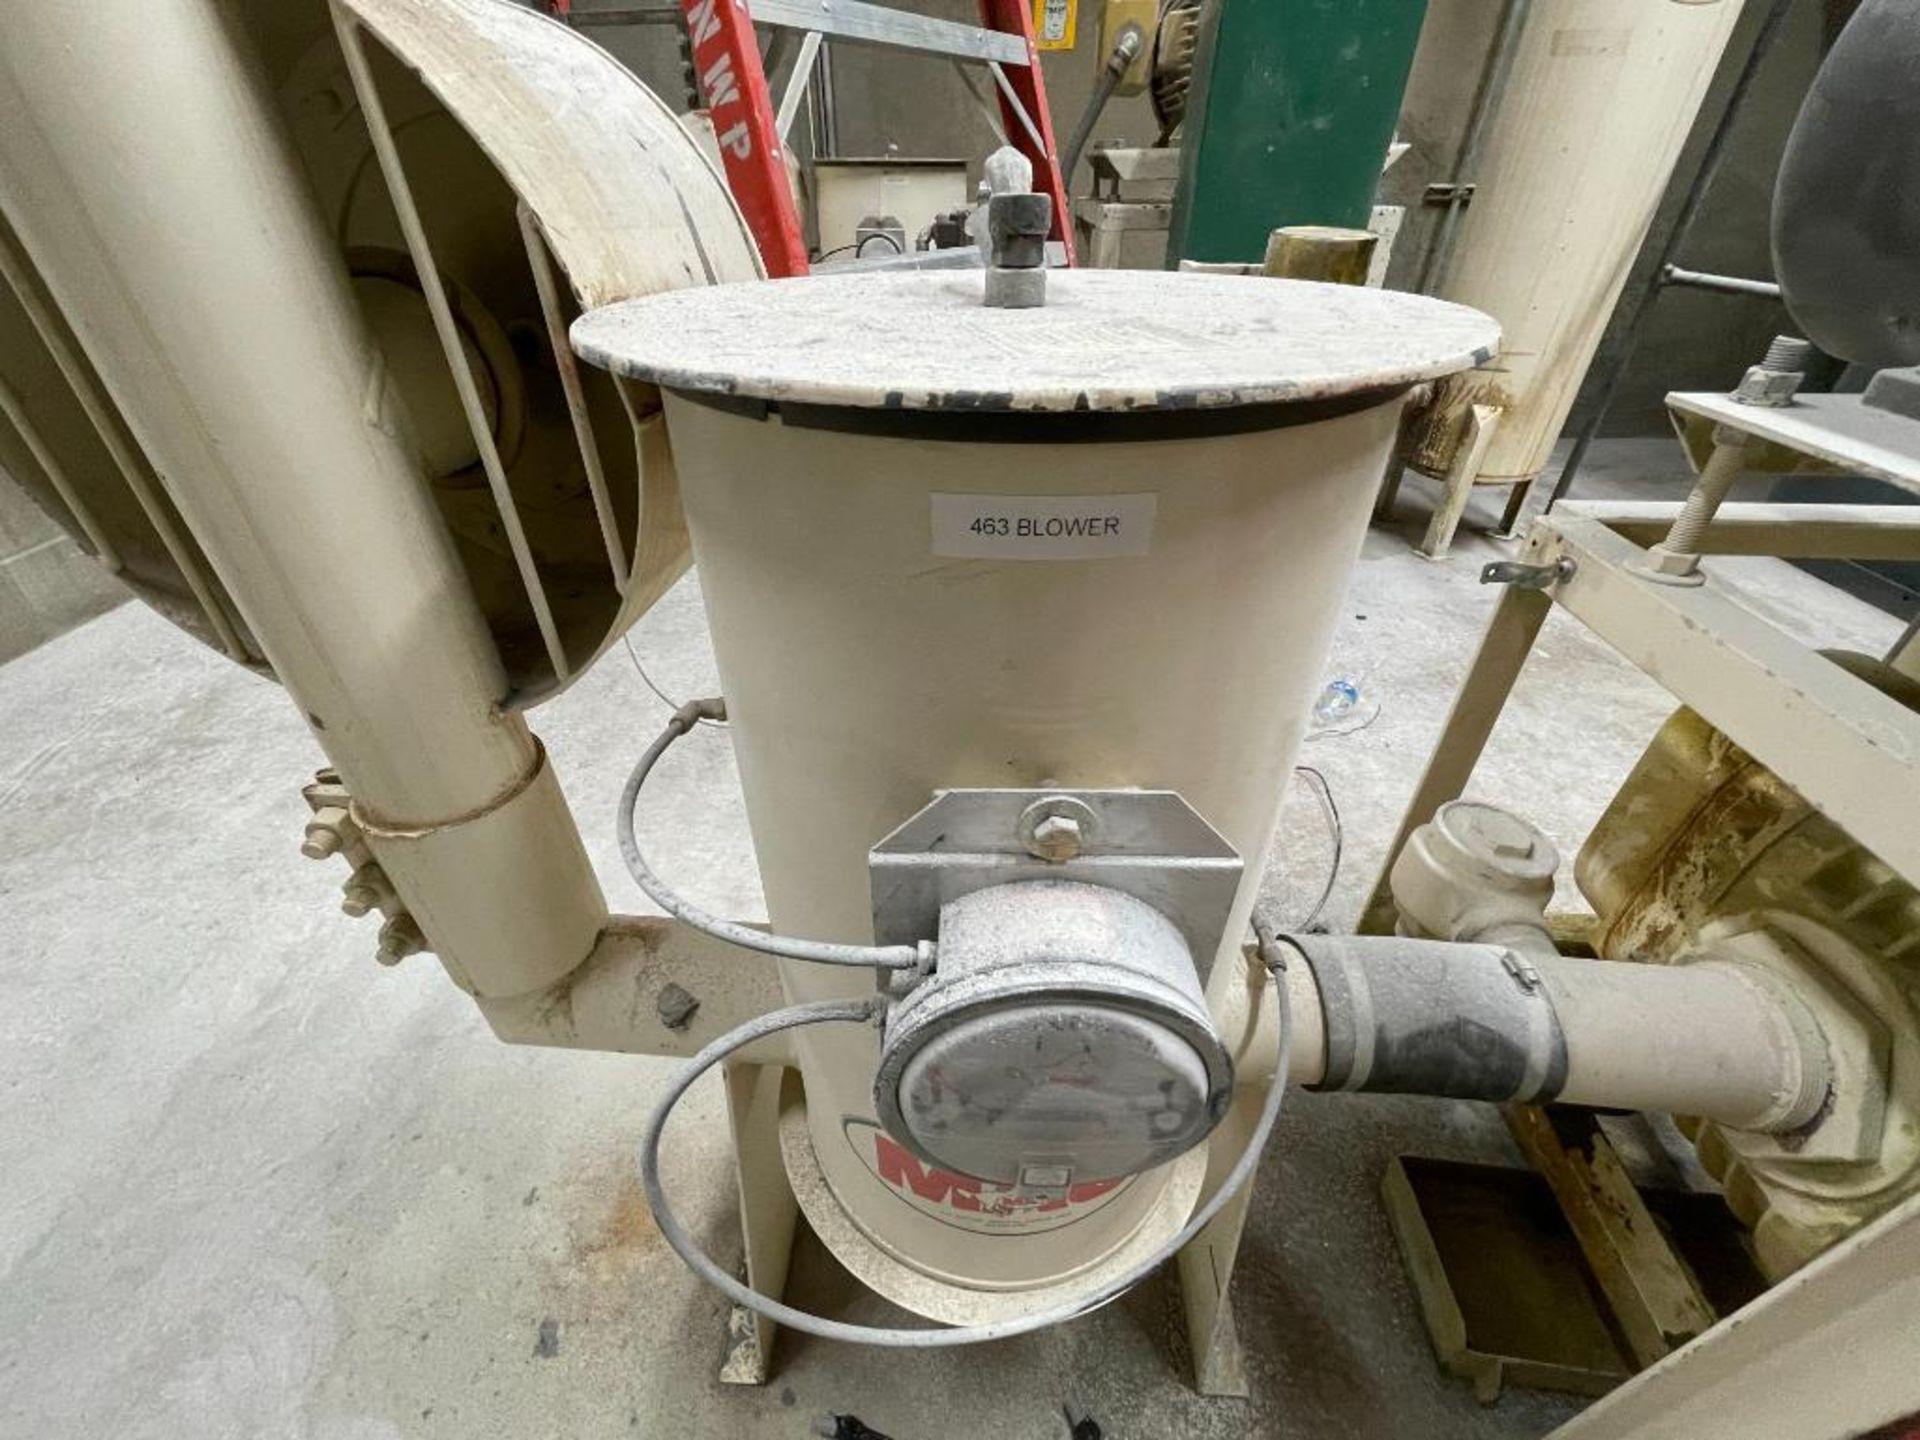 Sutorbilt rotary positive blower - Image 15 of 21